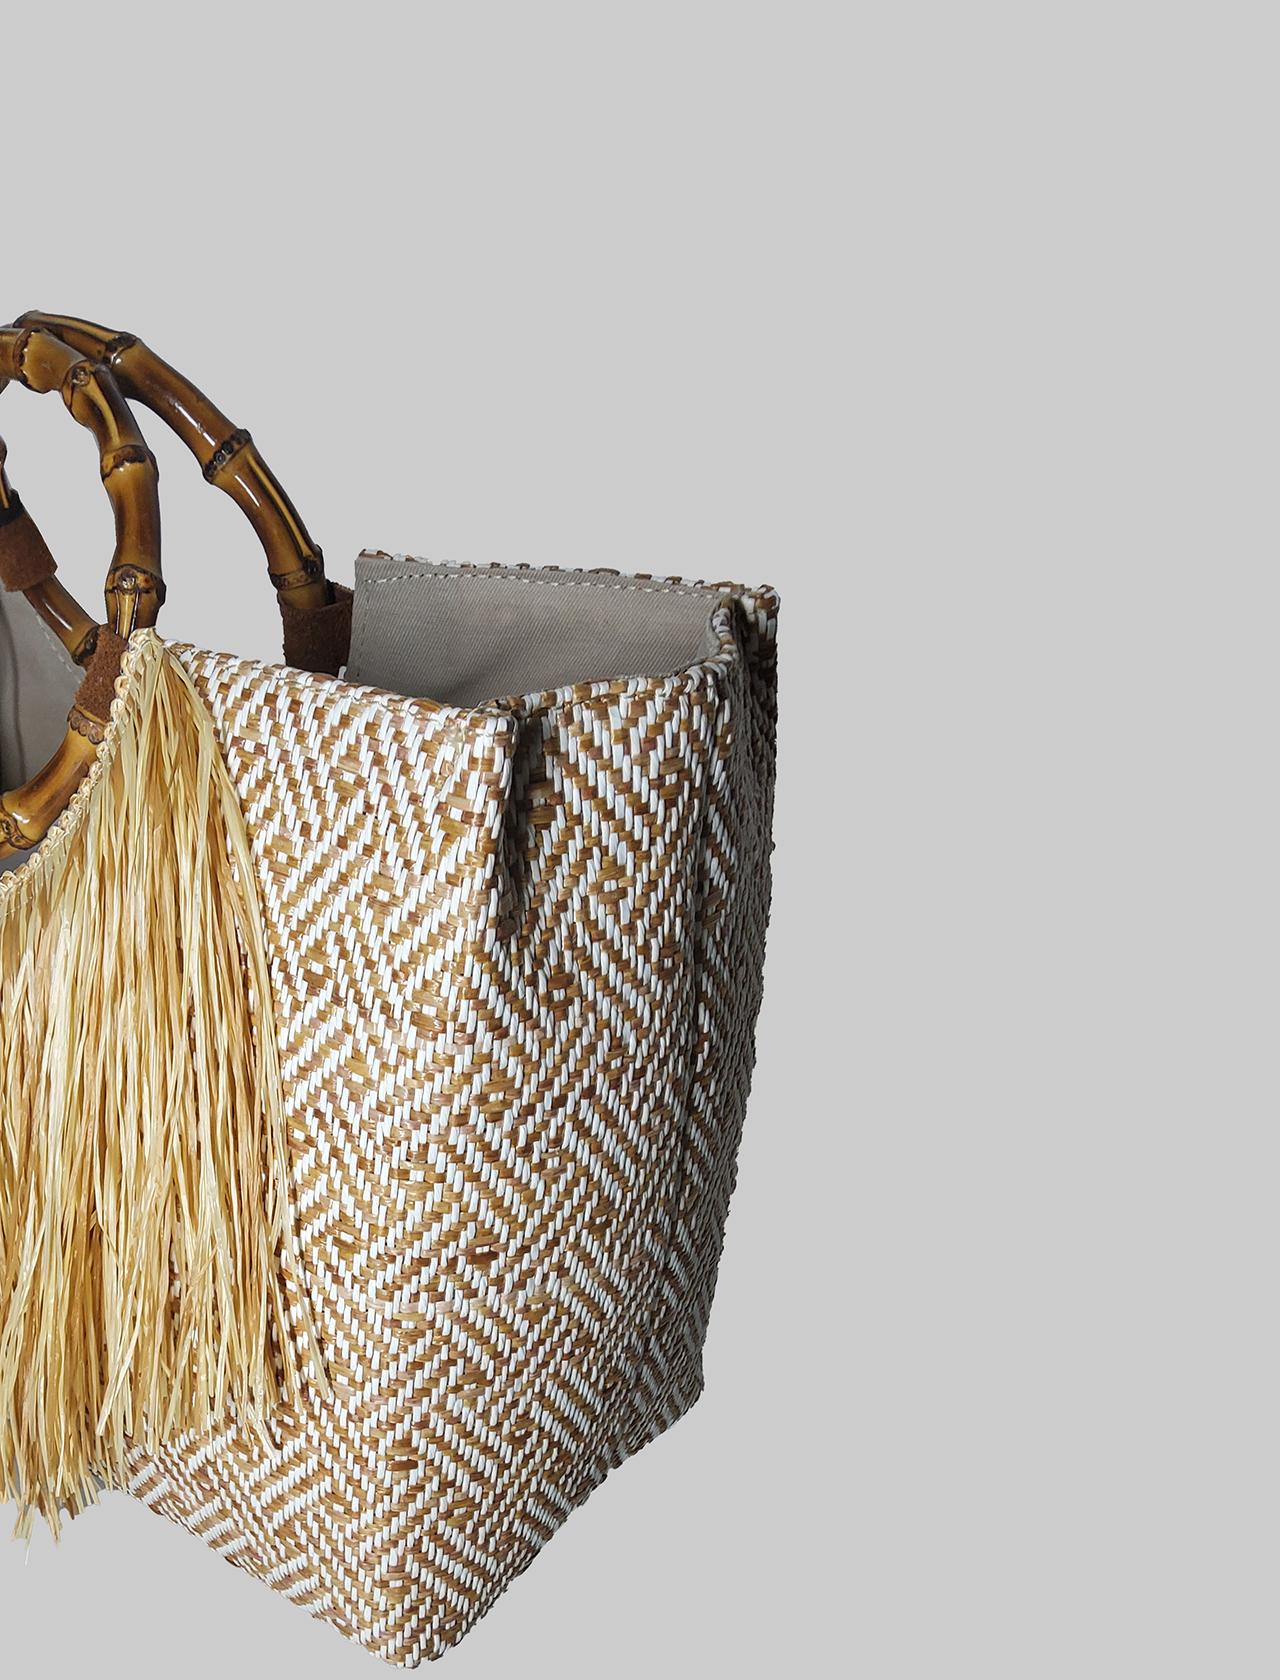 Borsa Donna Shopping in Rafia Naturale con Frange con Manici in Bamboo Via Mail Bag   Borse e zaini   BAMBOOA02